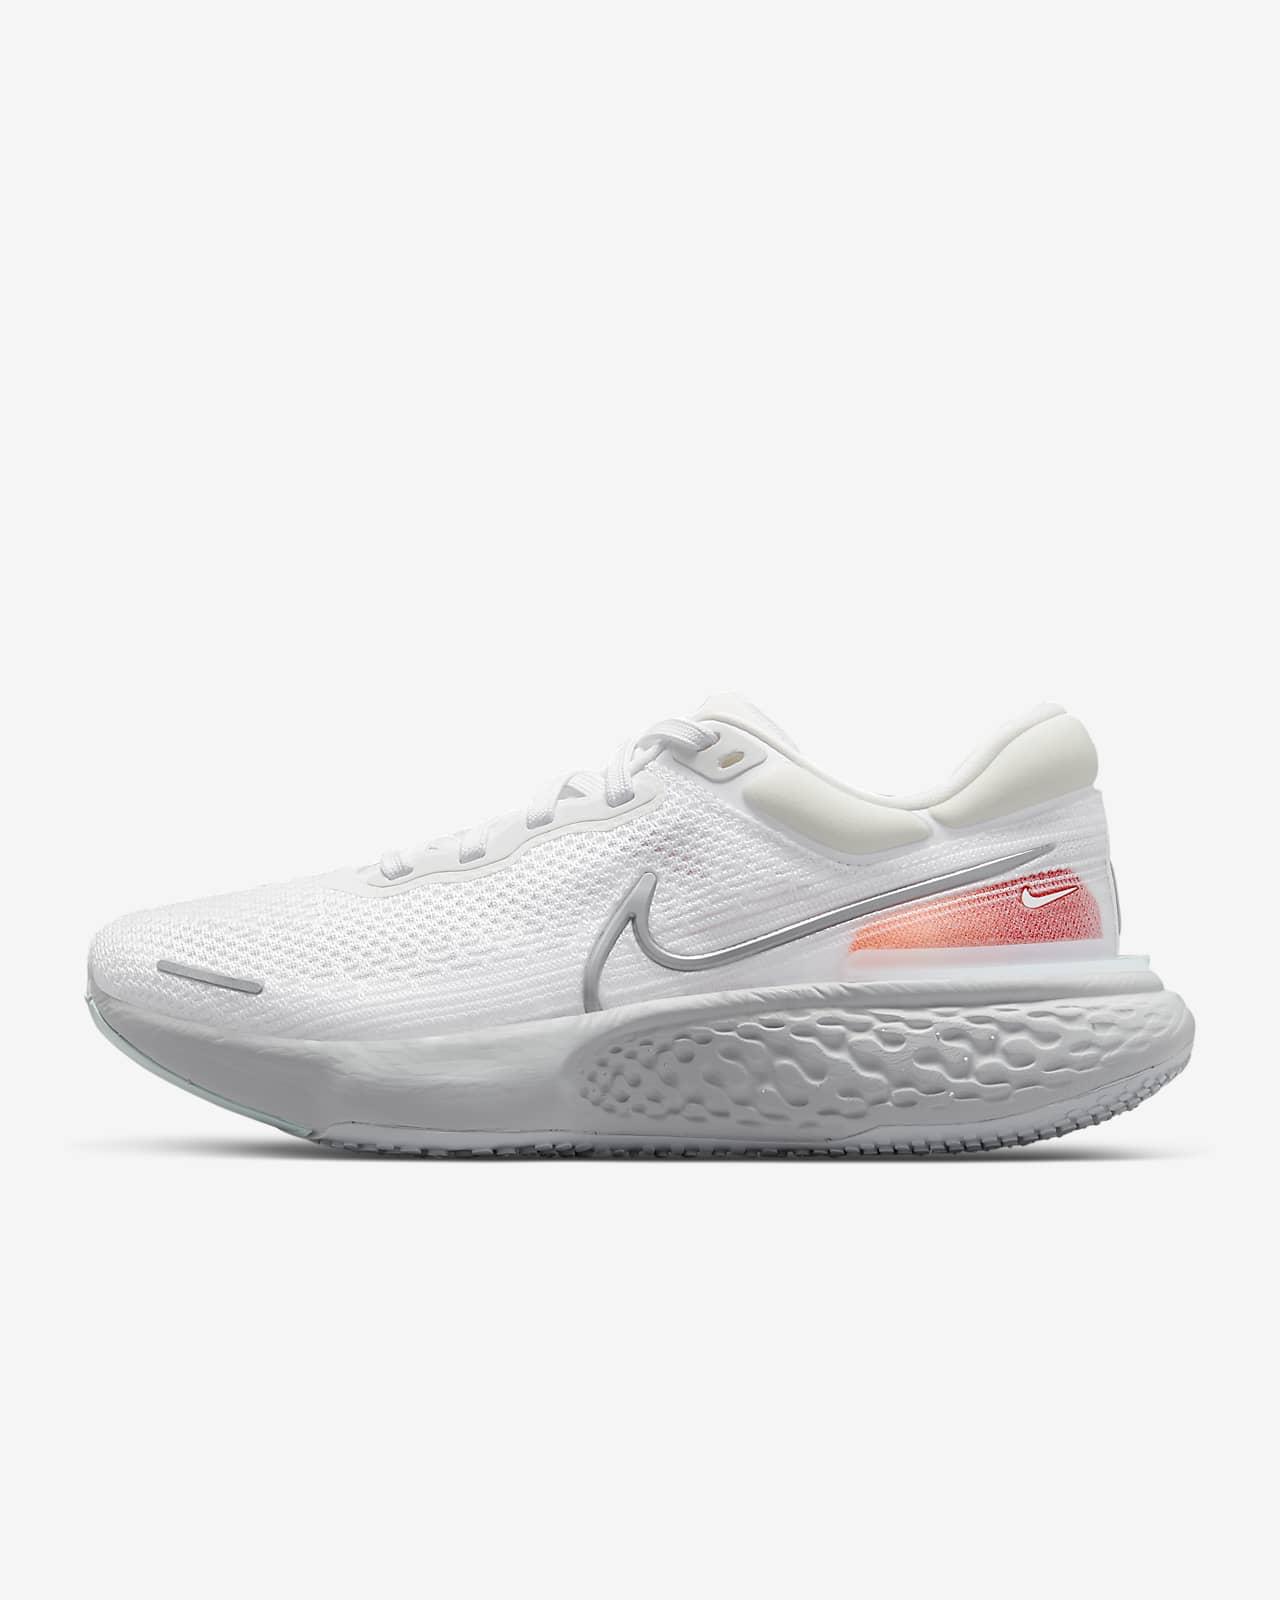 Nike ZoomX Invincible Run Flyknit Men's Road Running Shoes